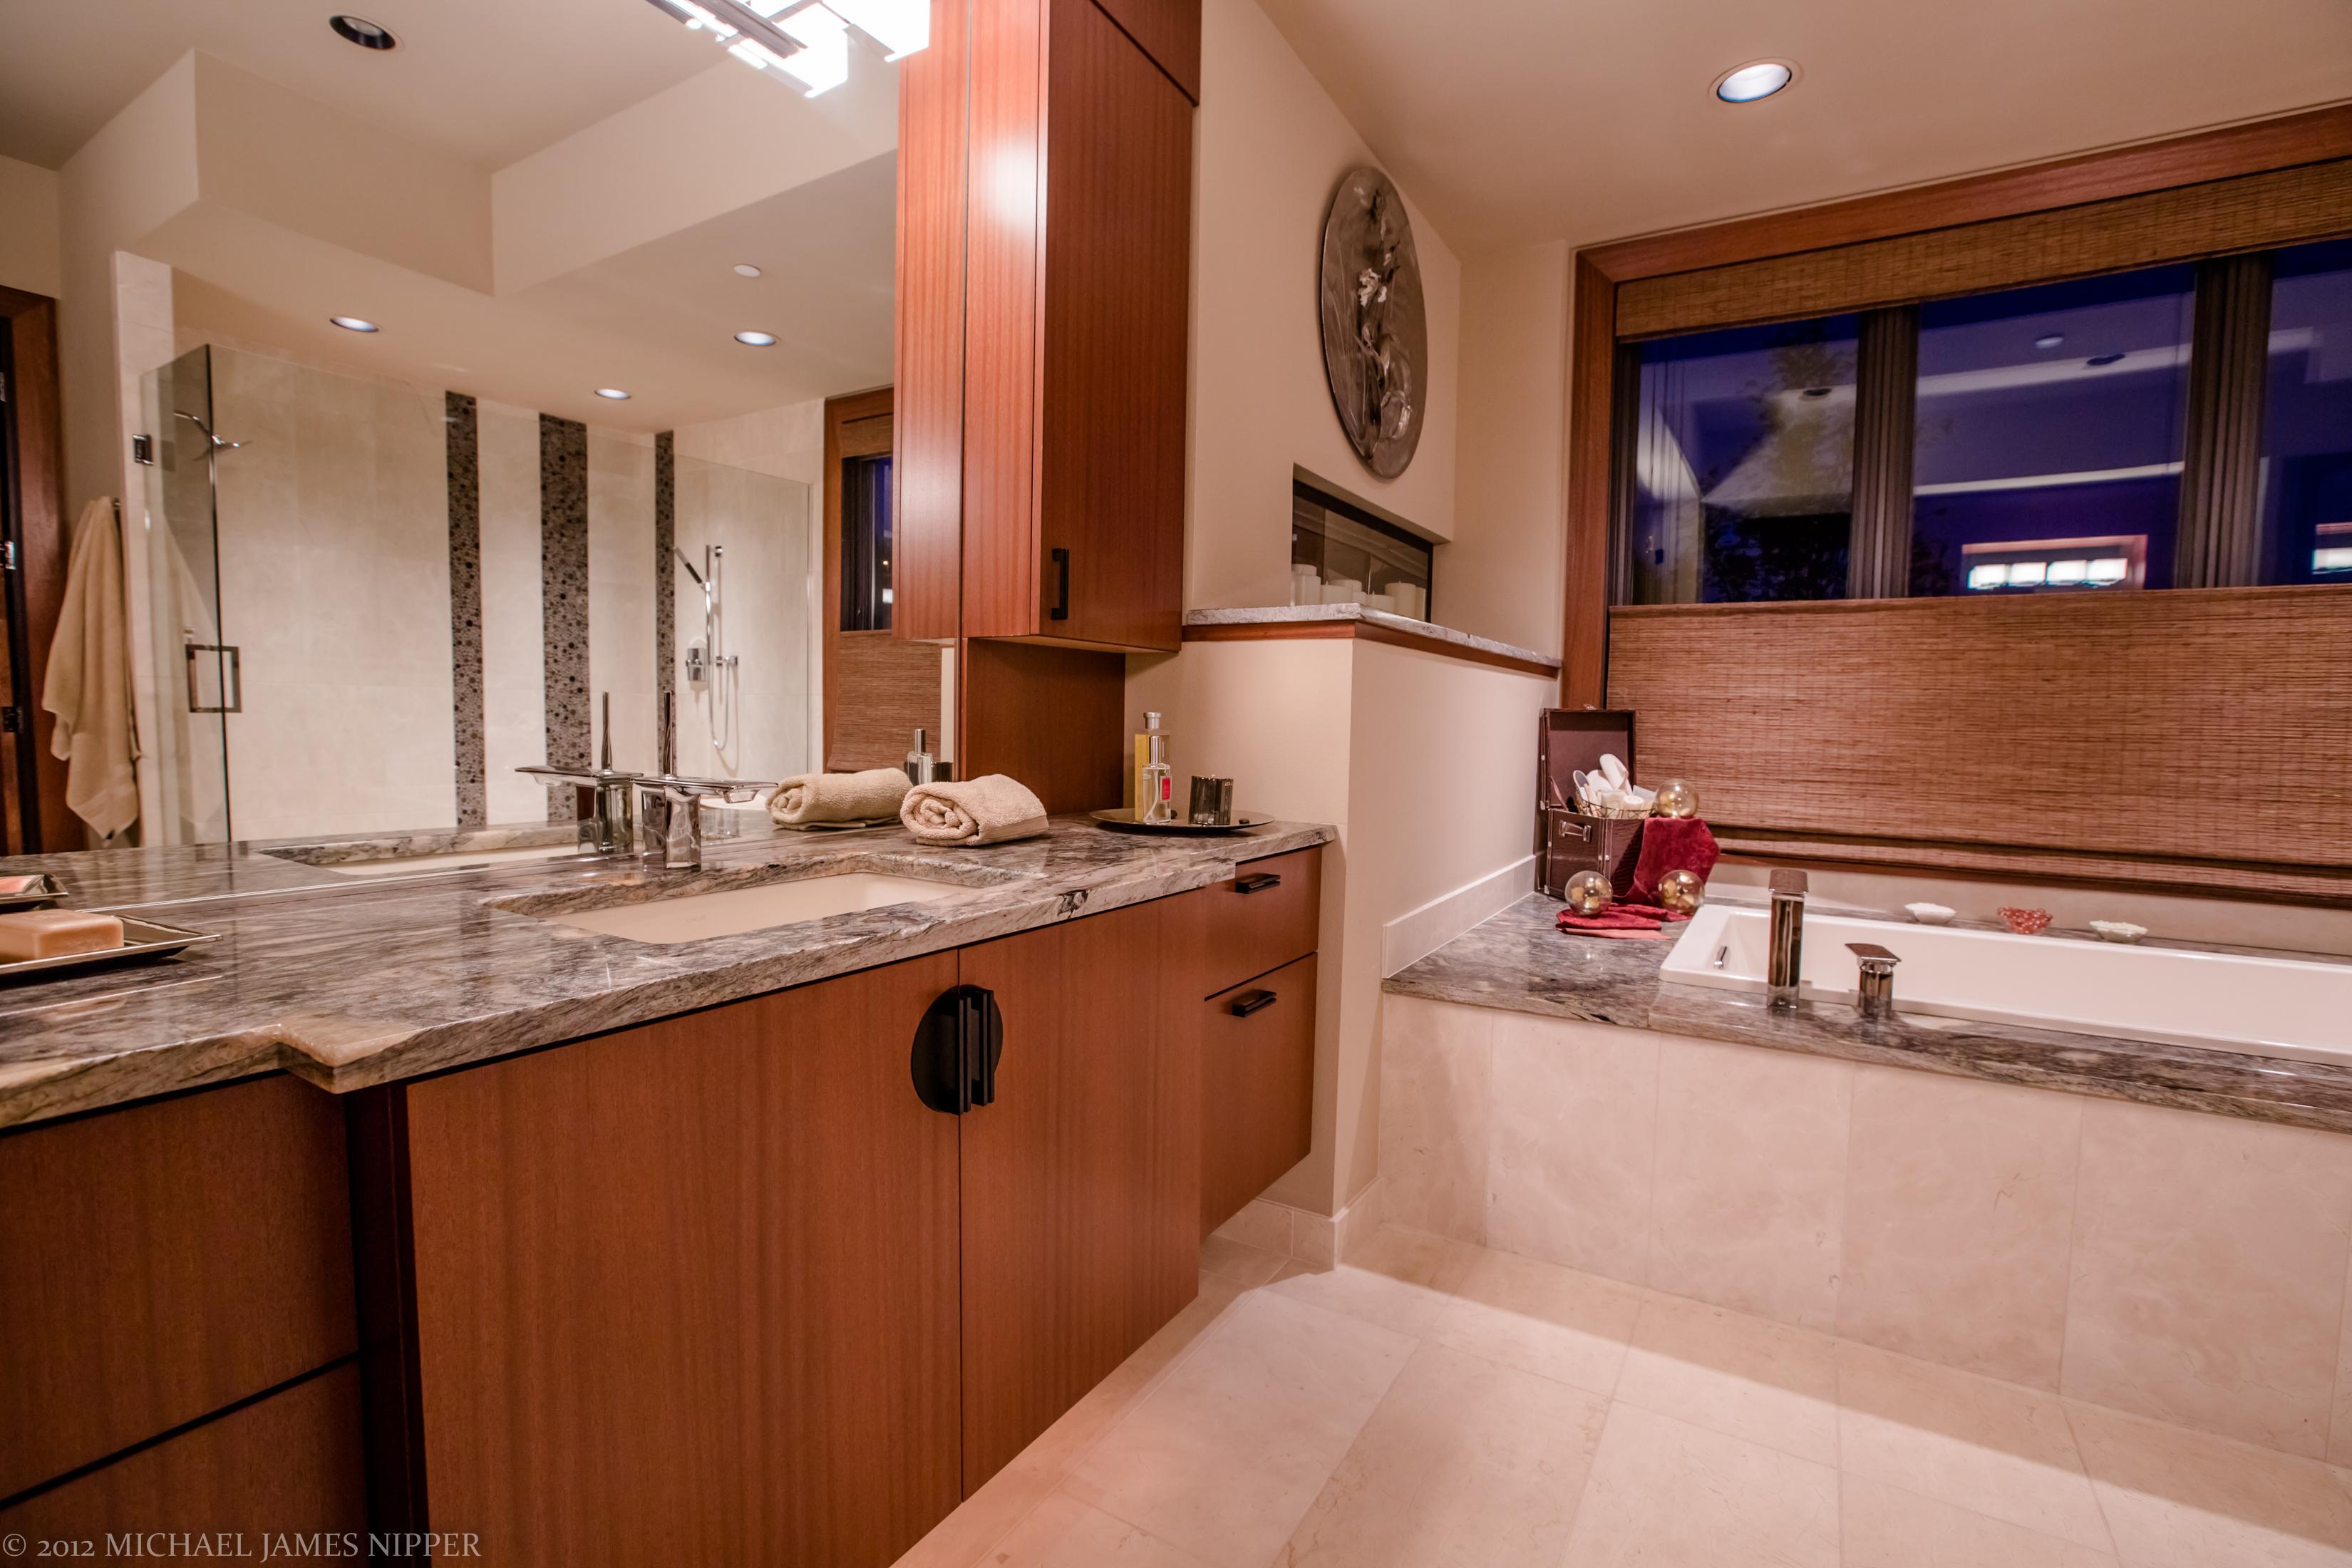 Master bathroom sink of 2013 Street of Dreams Custom Home 20-20 by Rick Bernard of Bernard Custom Homes.